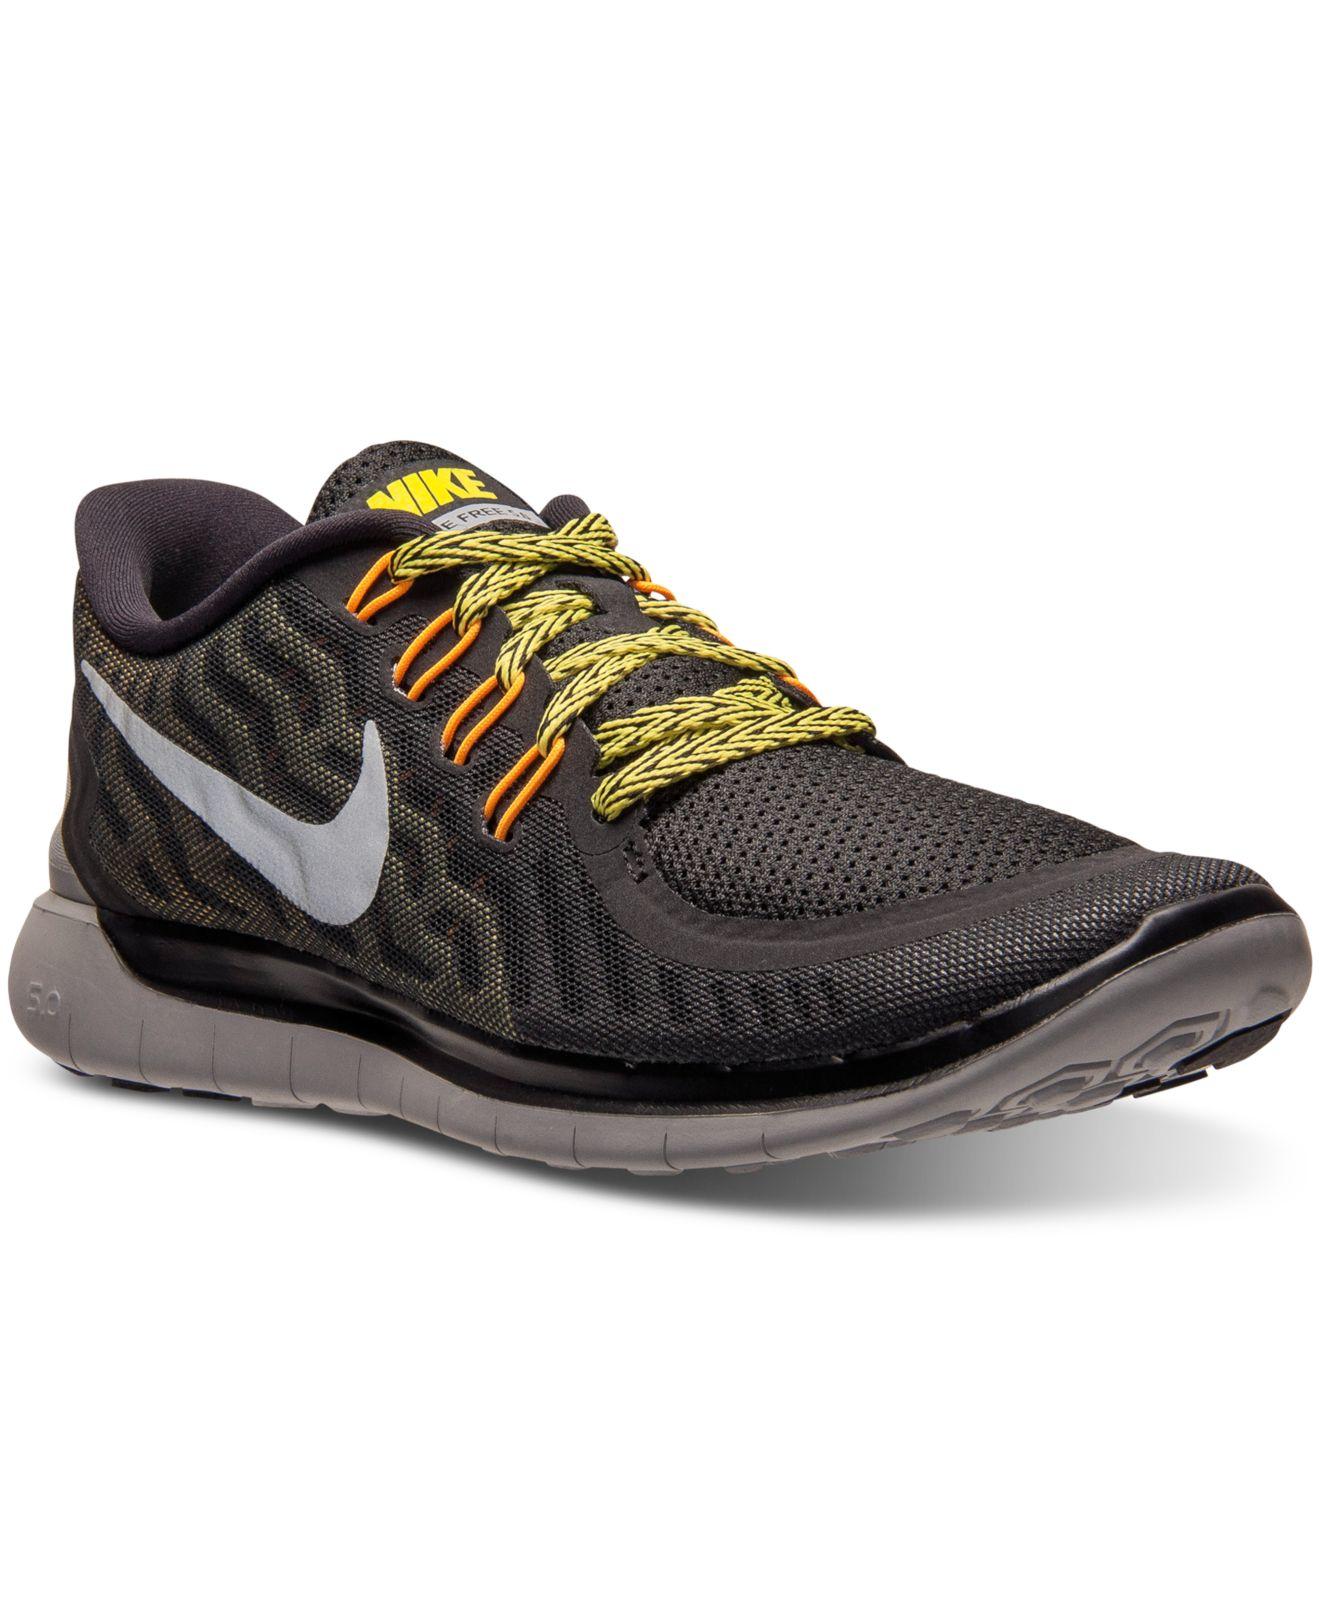 Latest Nike Shoes In Macys